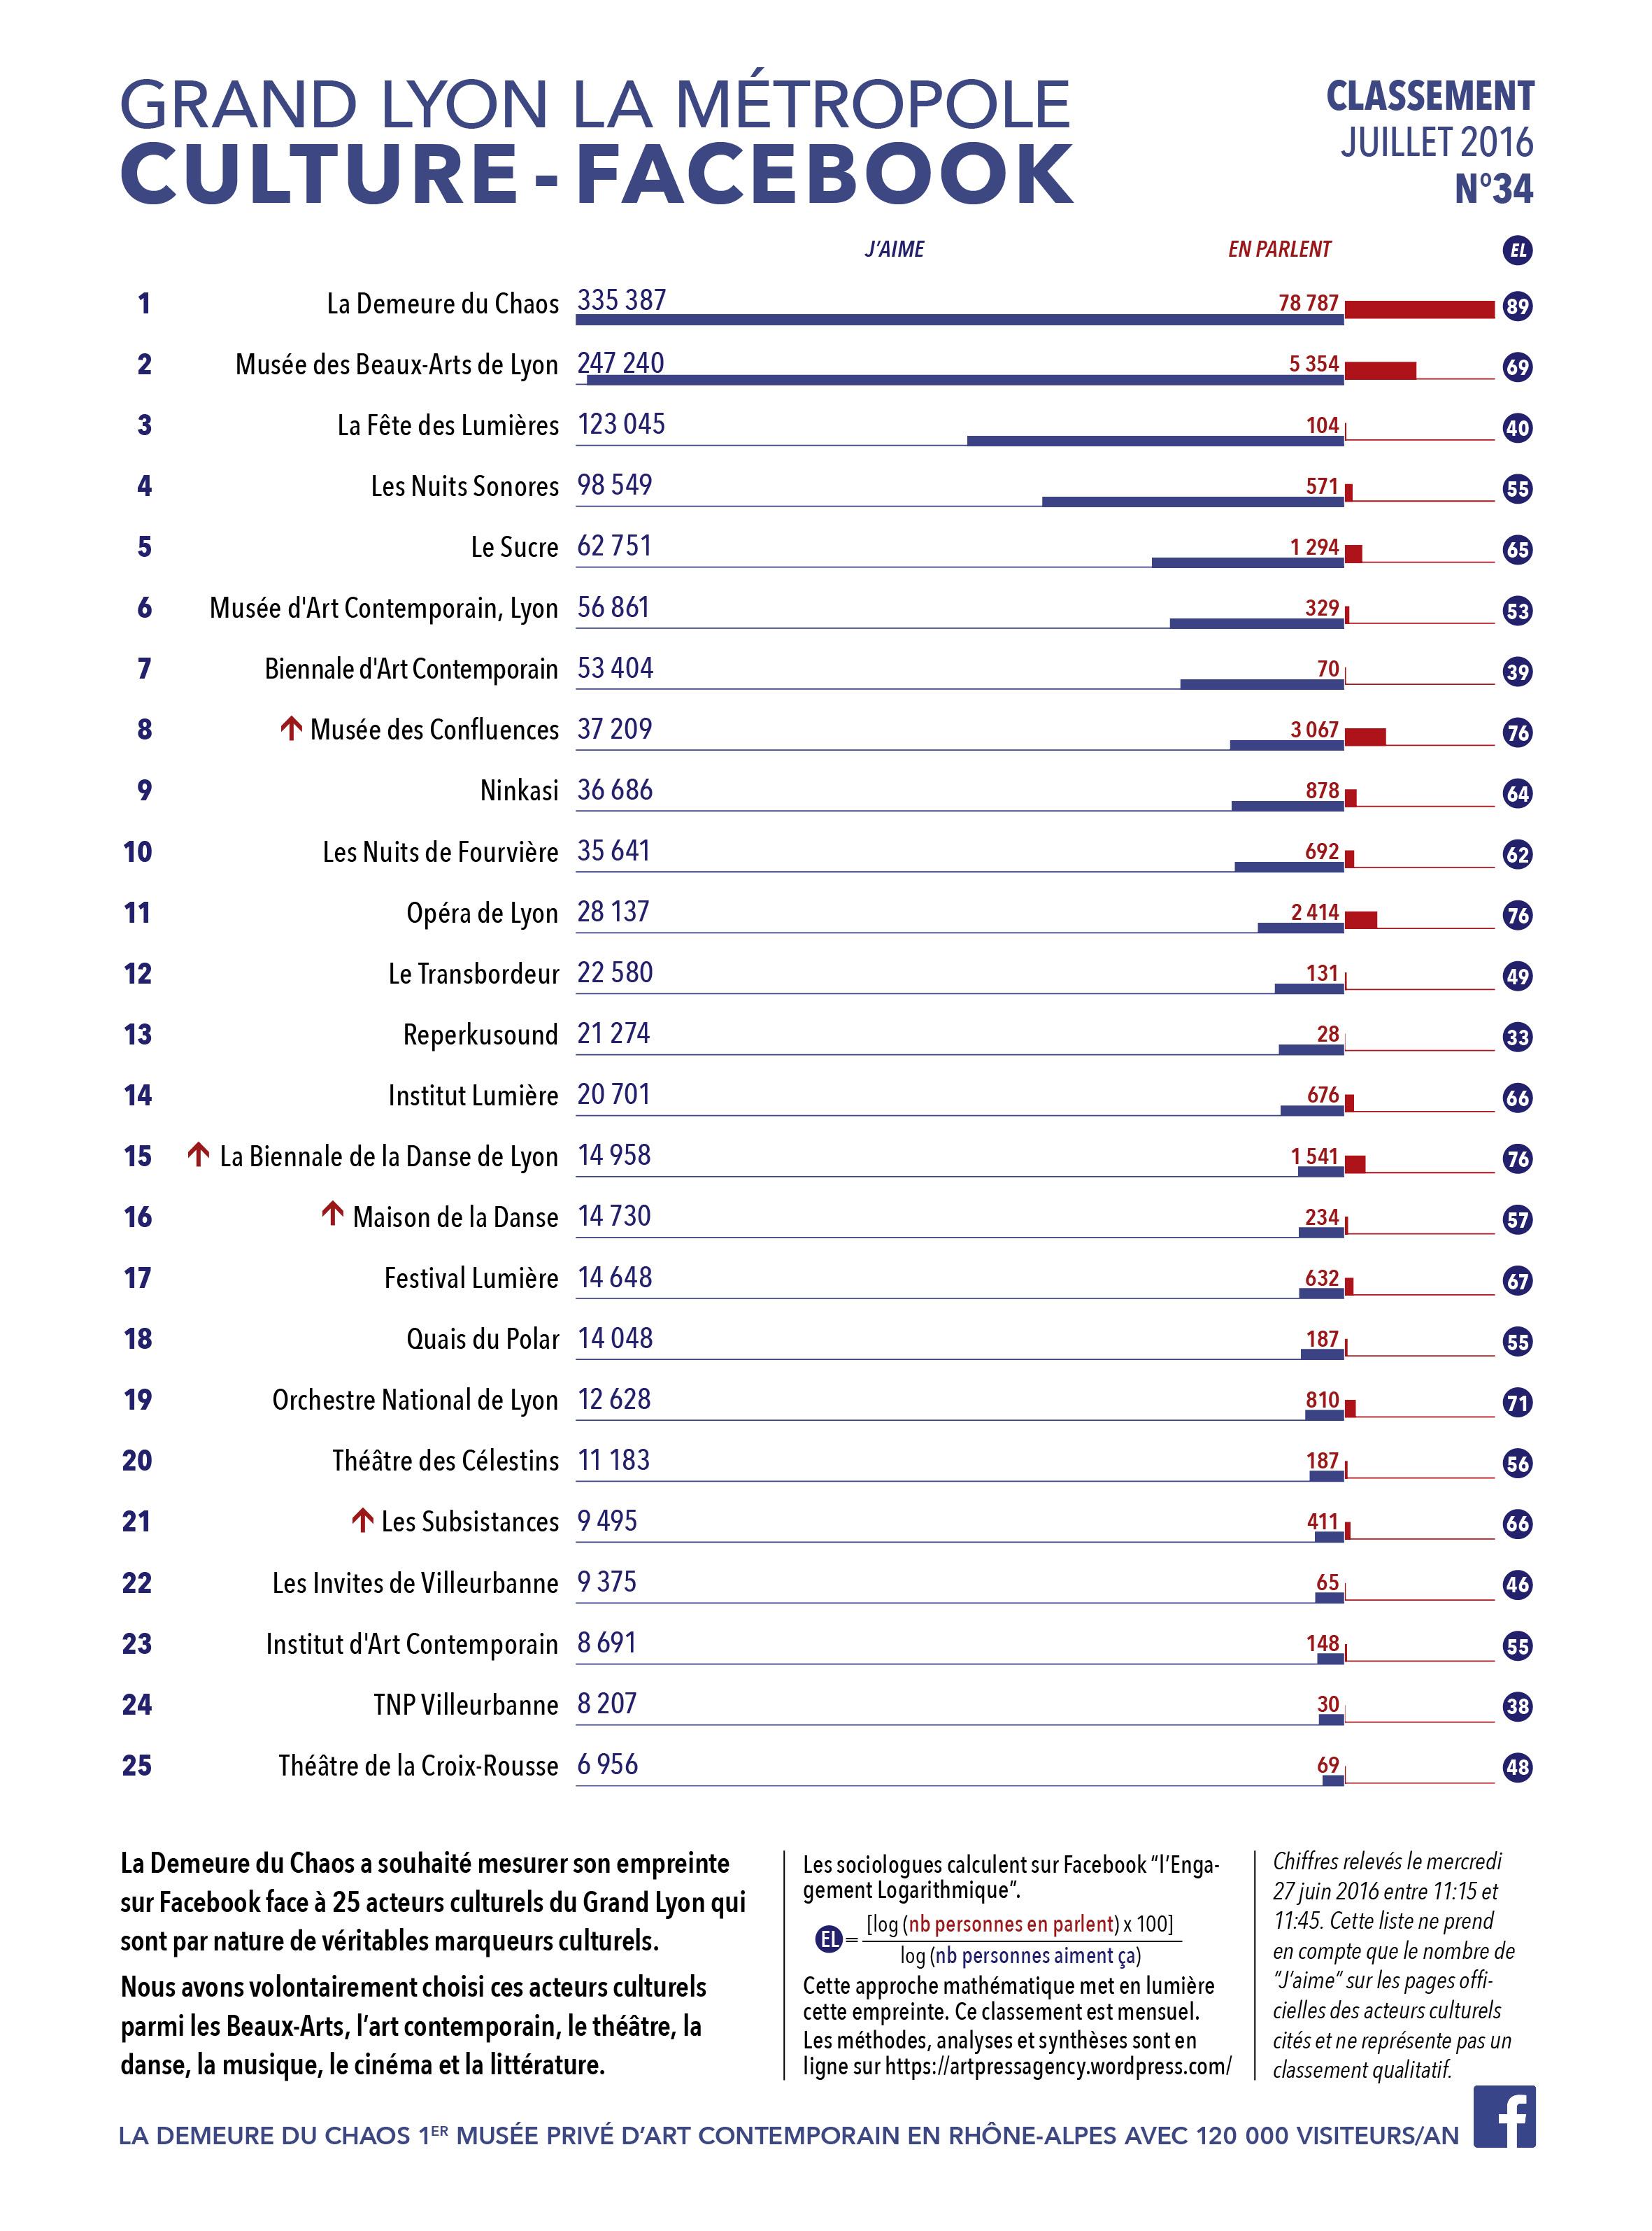 classement-ddc-facebook-juillet